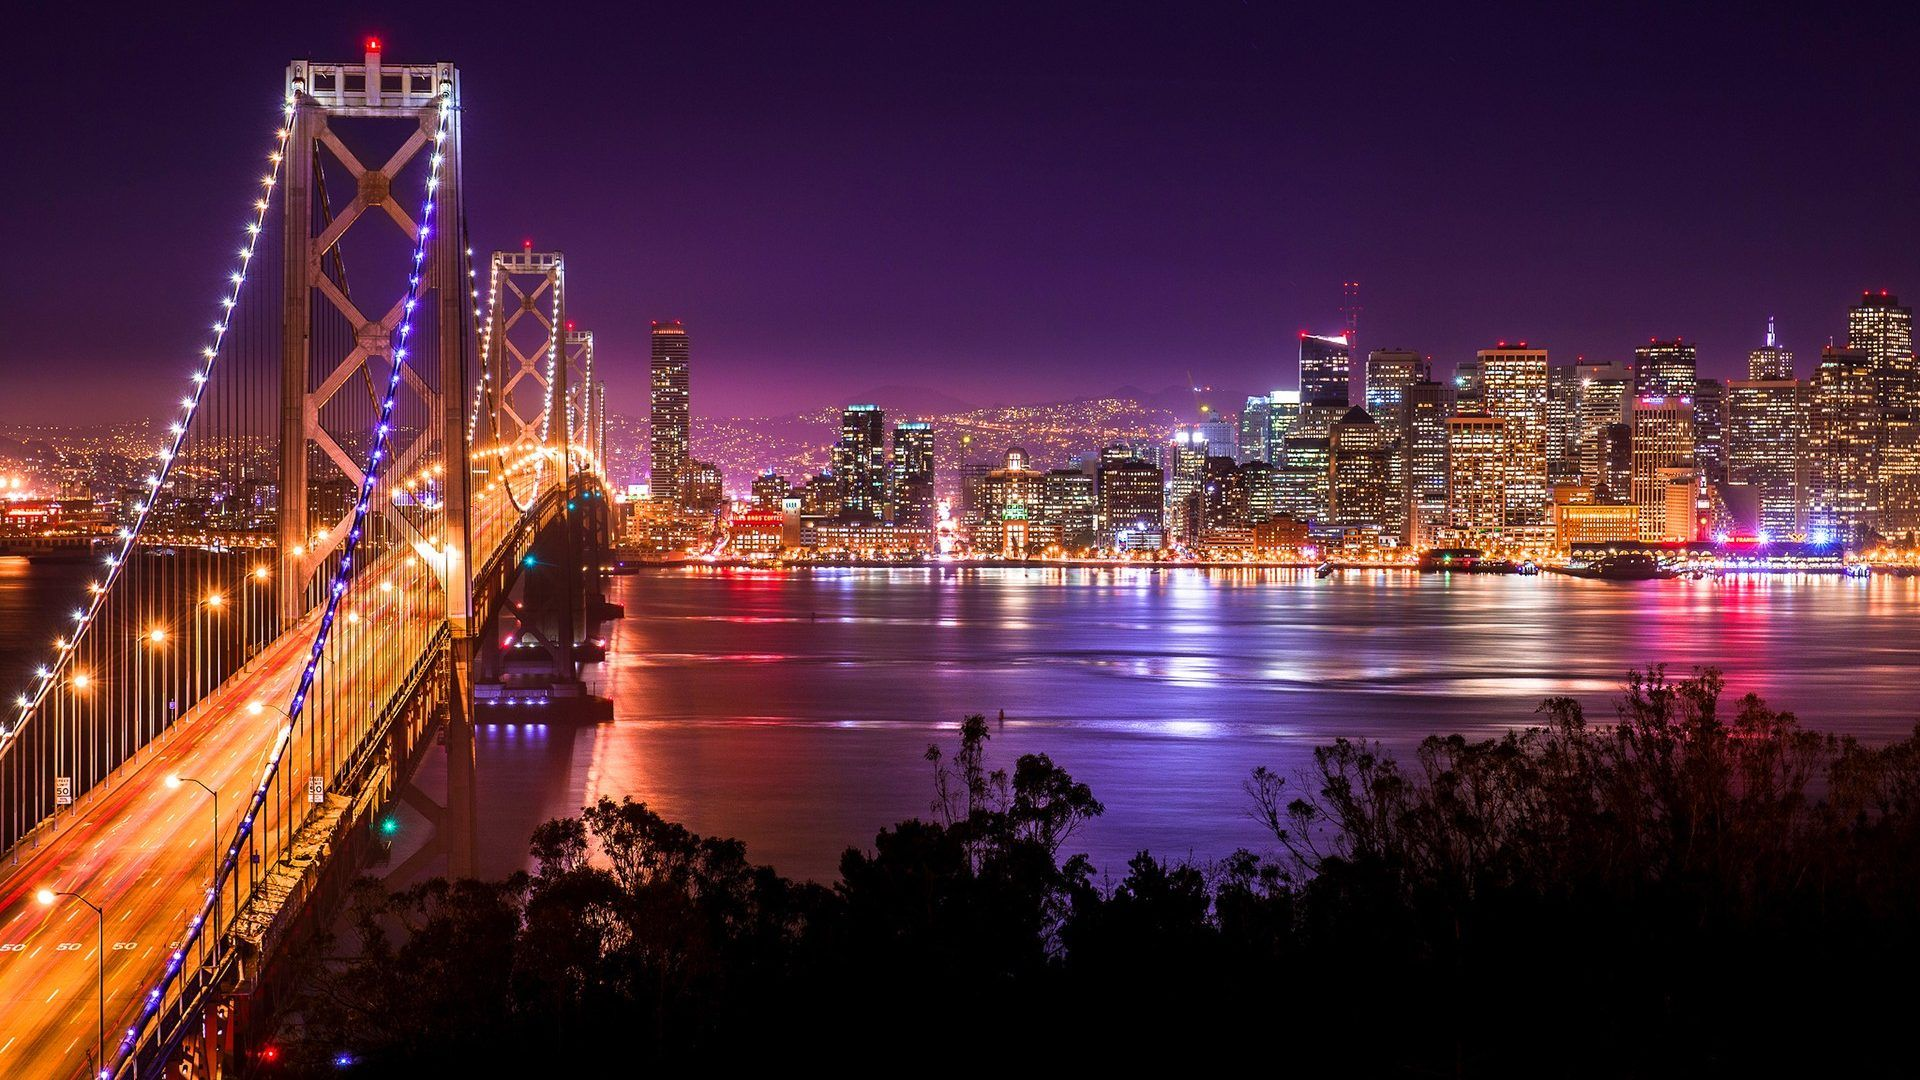 Golden Gate Bridge Night San Francisco Bridges Architecture High Quality Wallpaper Cidades Do Mundo Cidade Mares